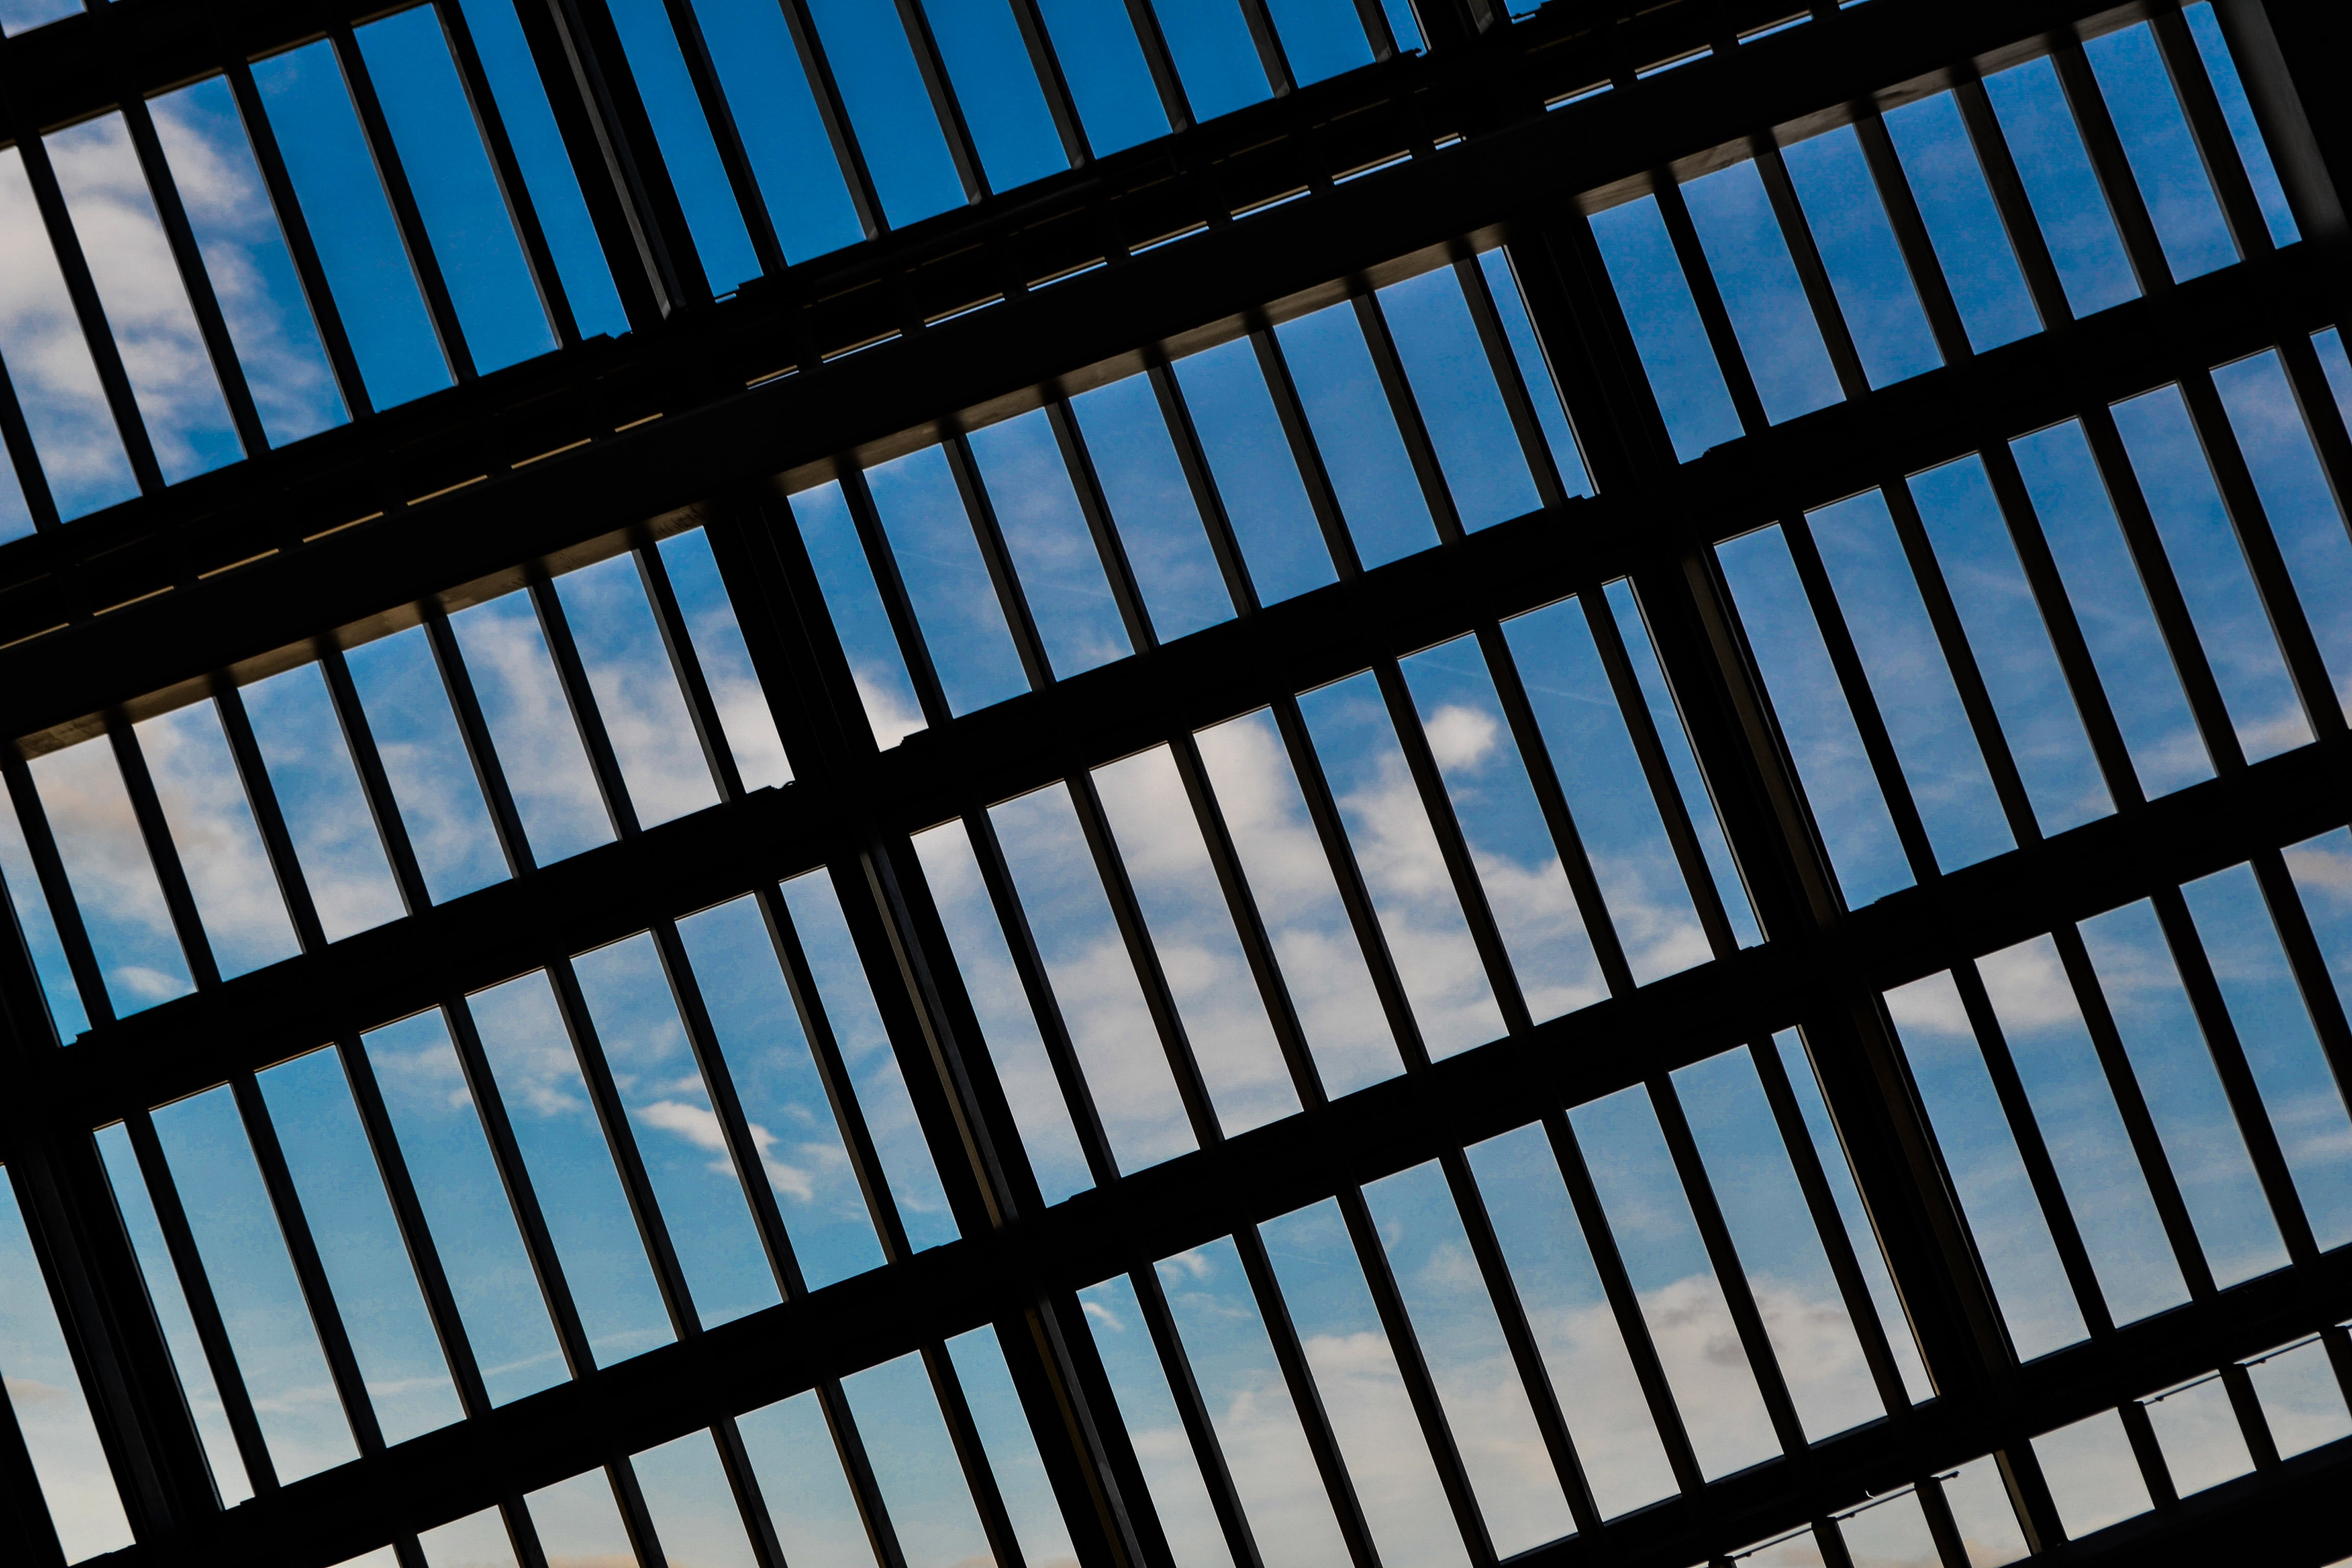 Black Steel Cage